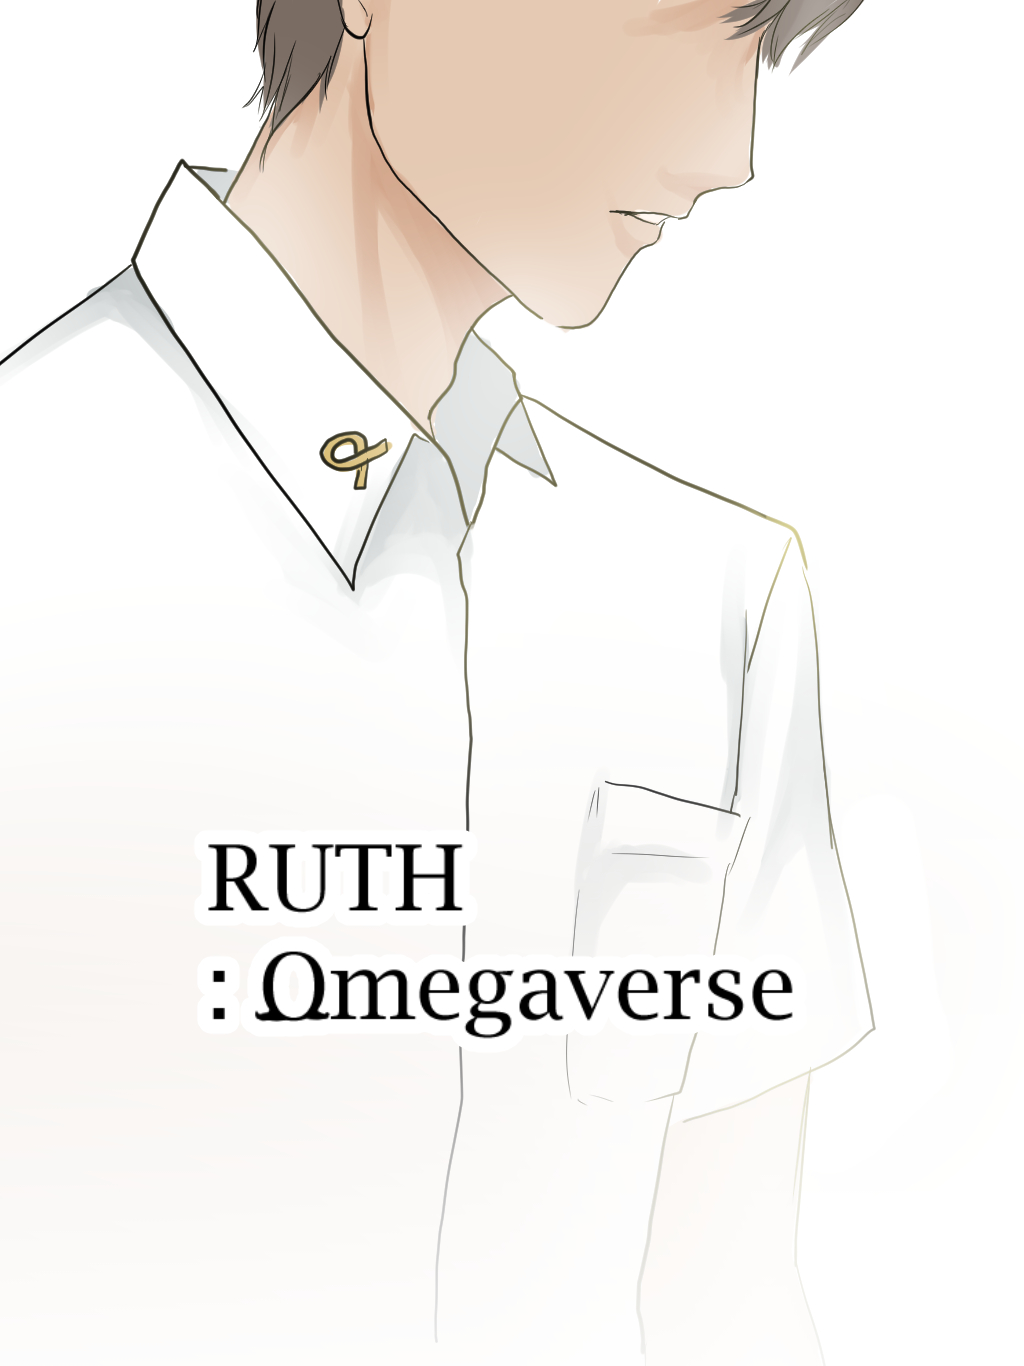 RUTH : Omegaverse